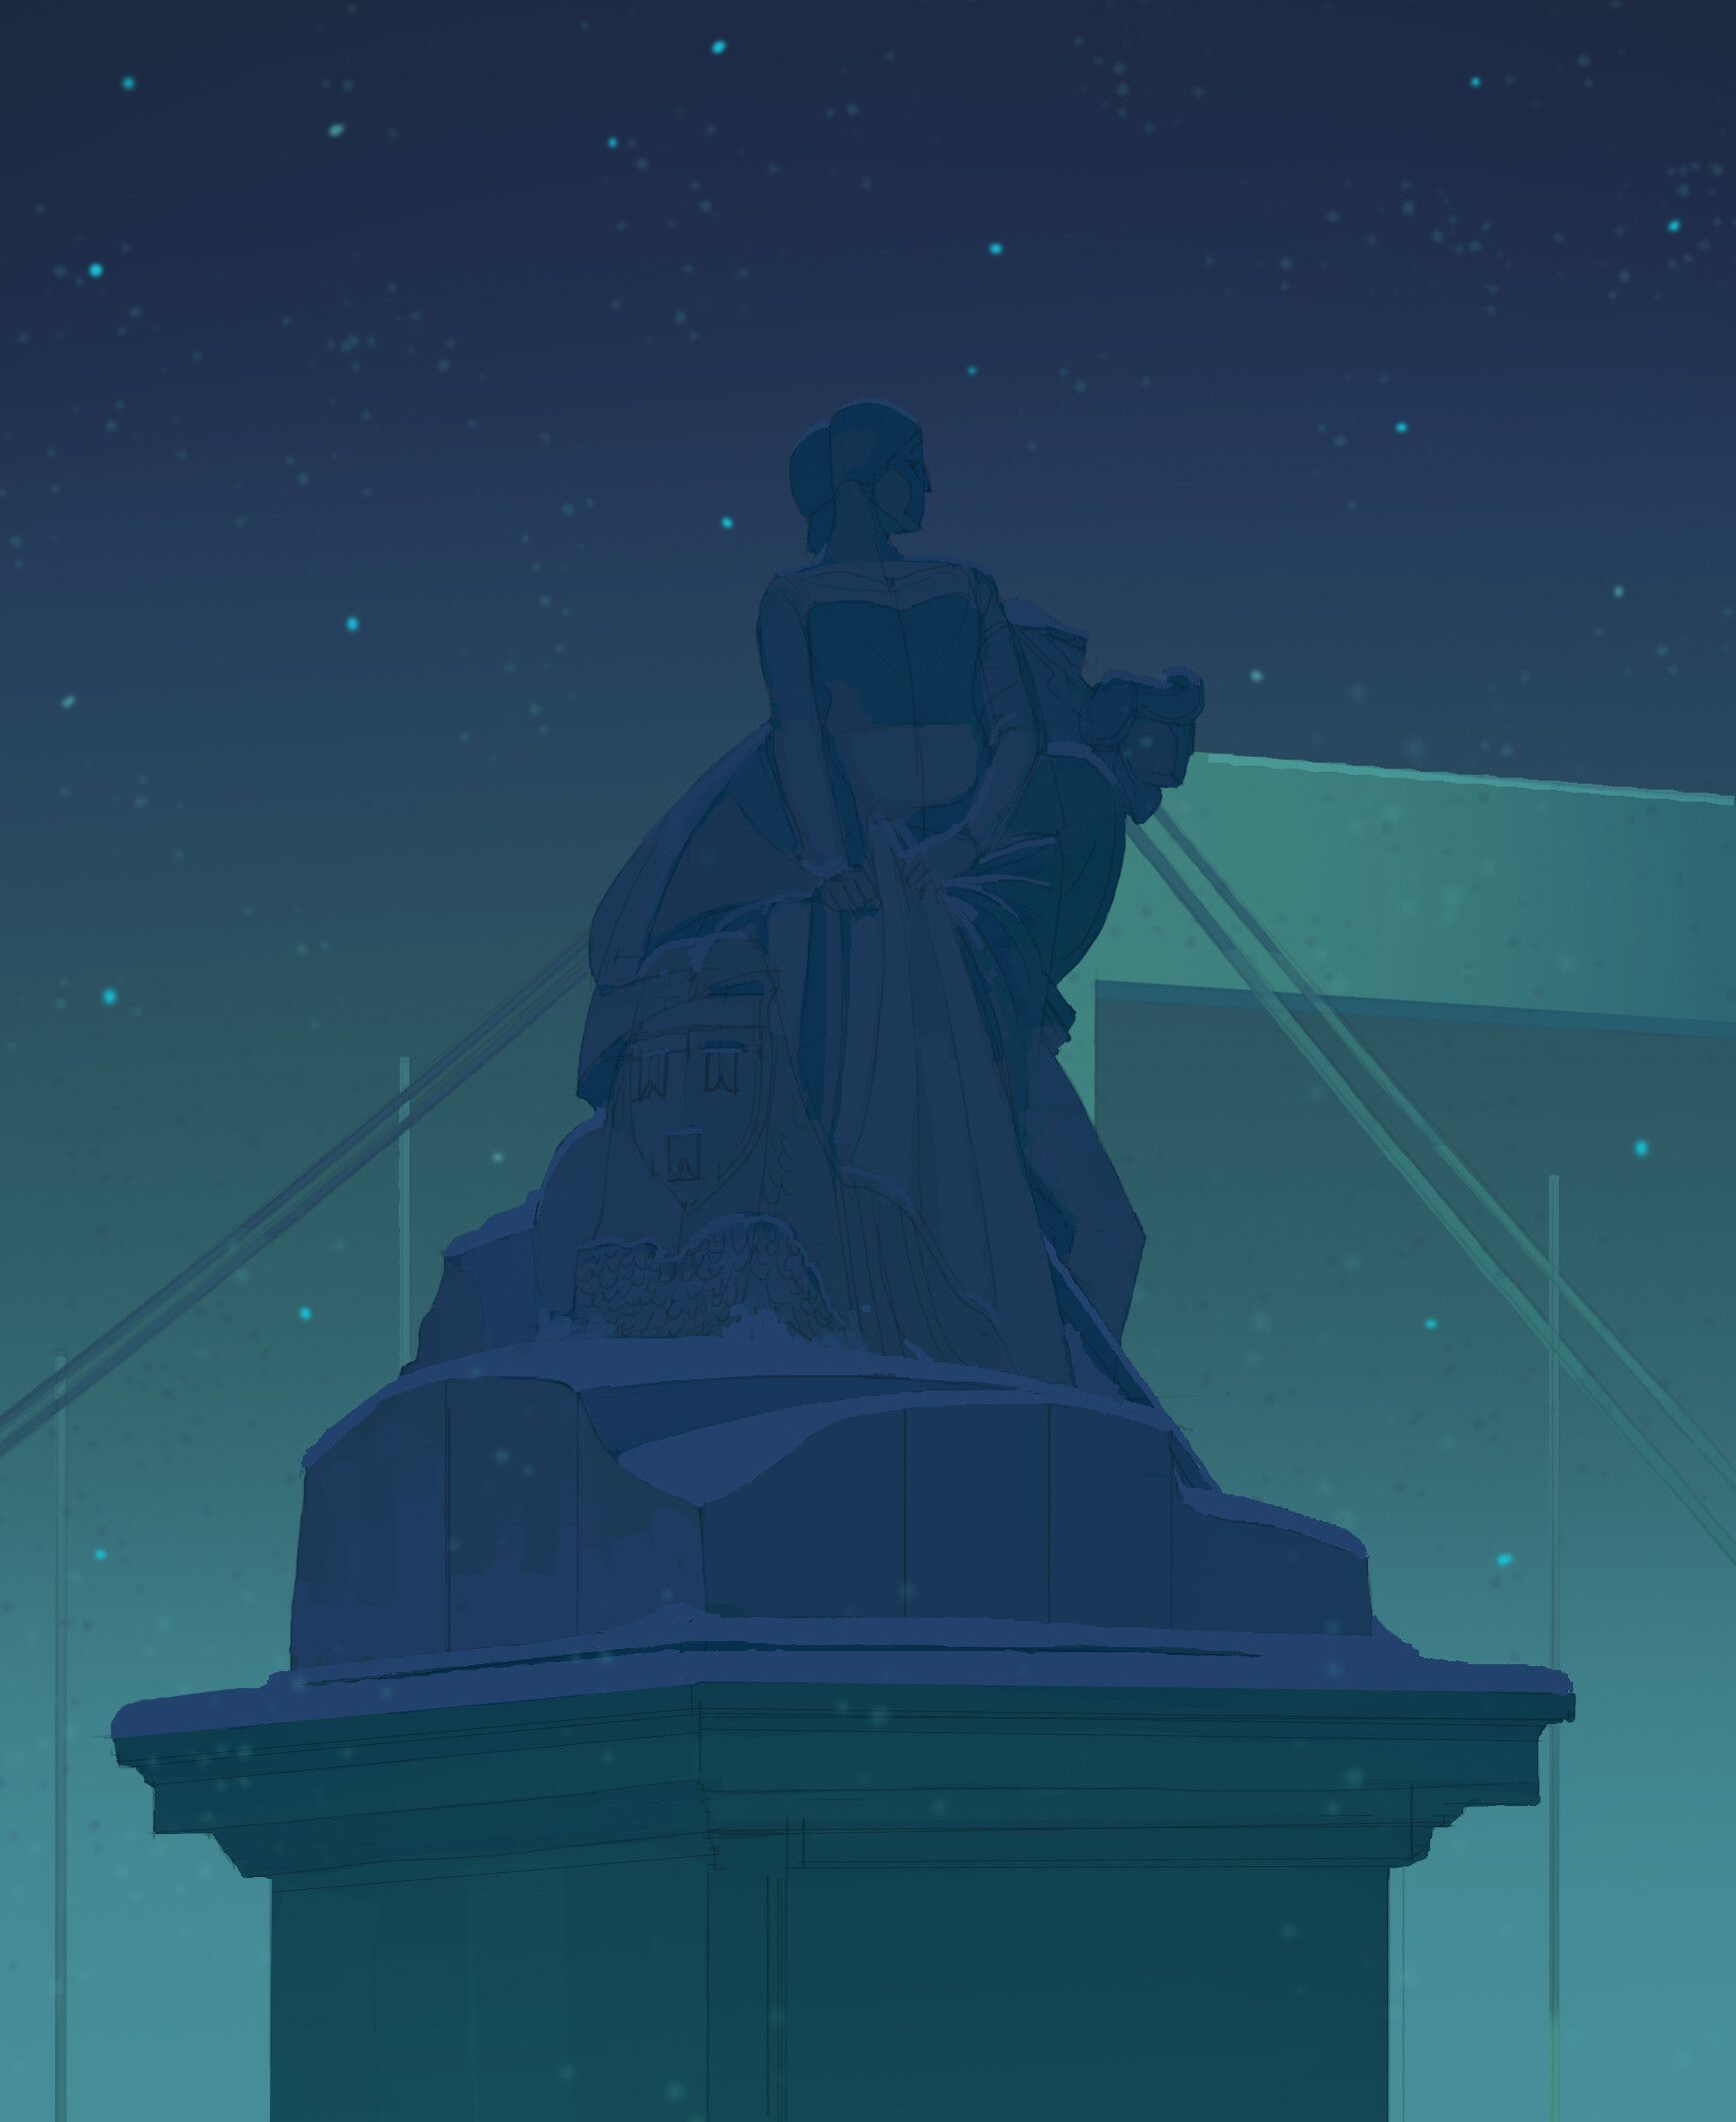 Анимация статуи свободы Чики во фнаф ар.Liberty Chica full ...